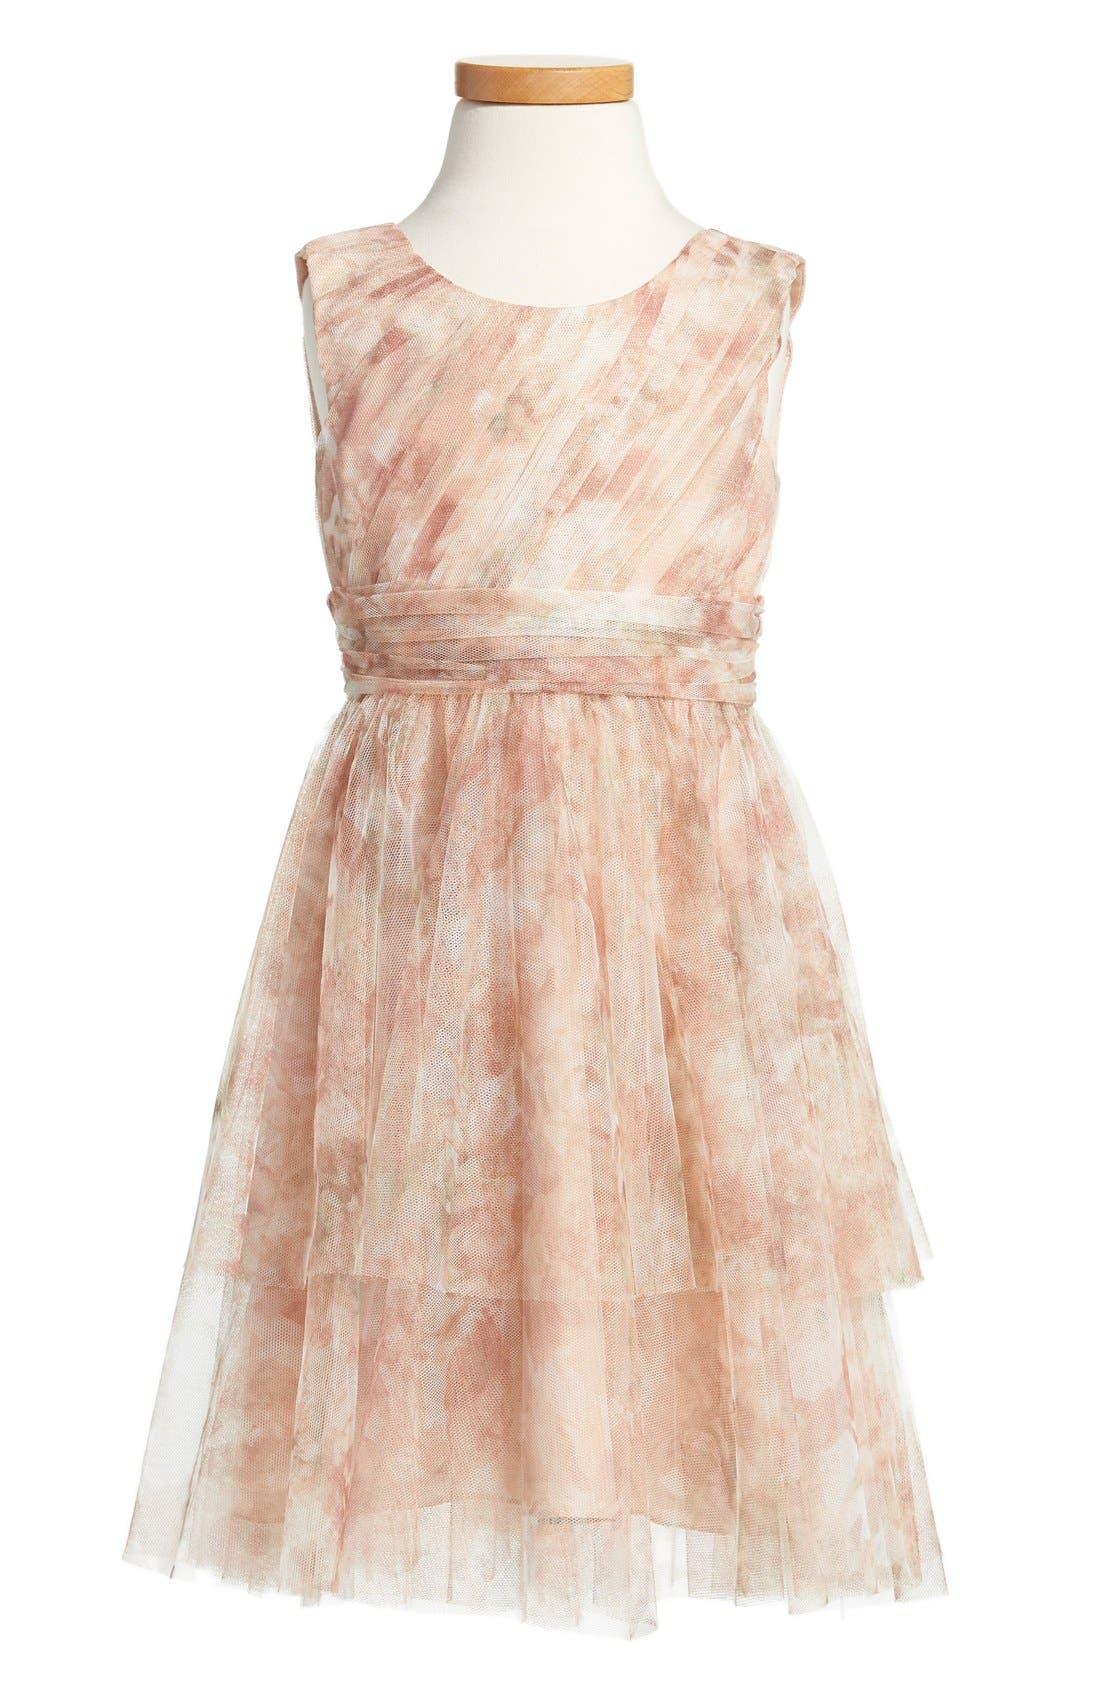 Etsy - Vintage Floral Tulle Dress,                             Main thumbnail 1, color,                             Blush Multi